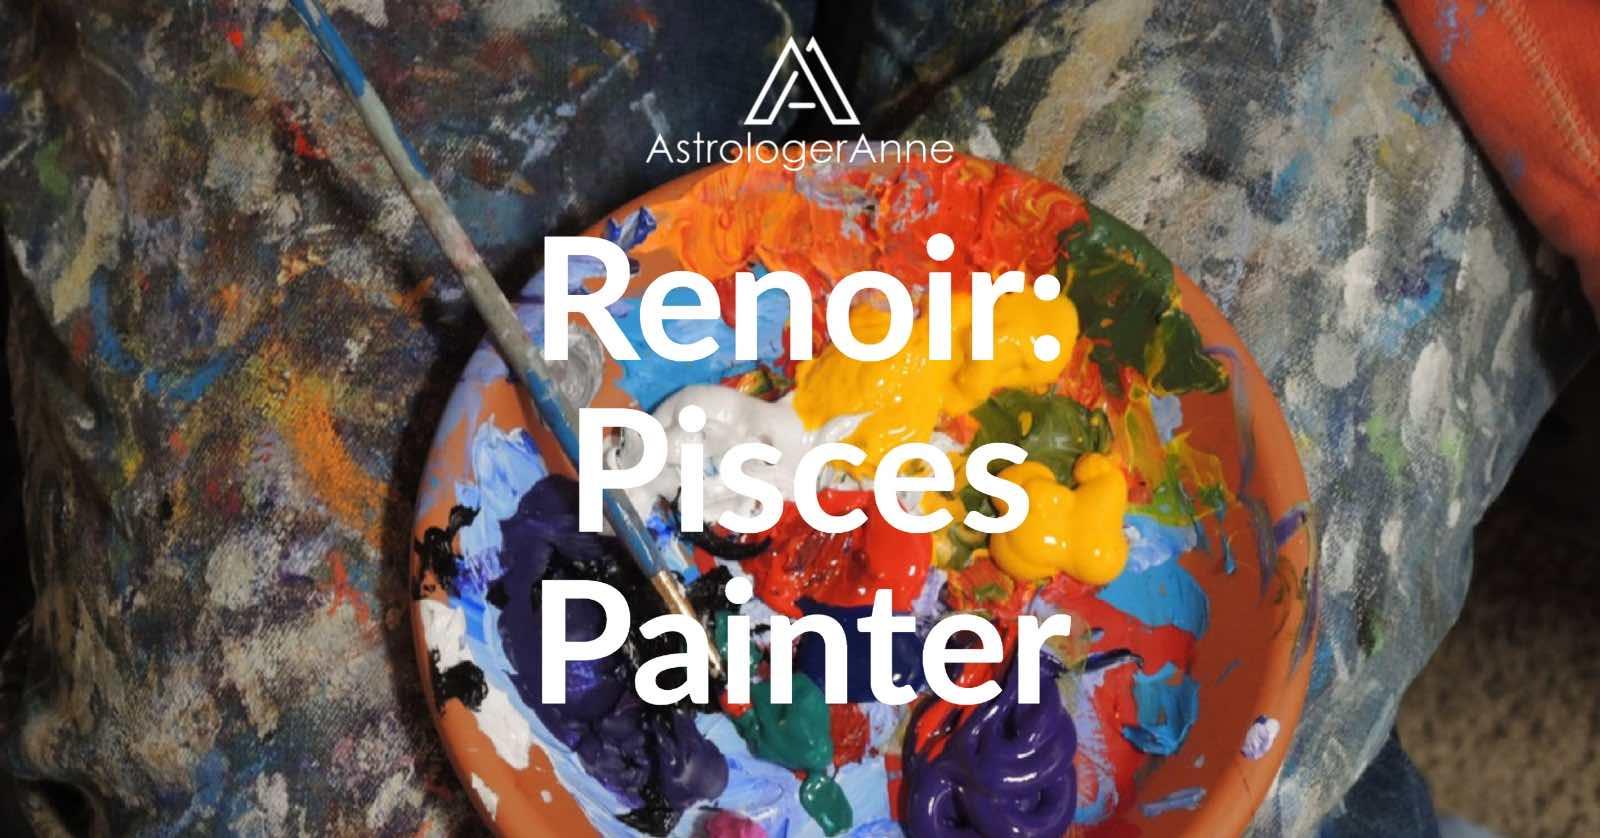 Pierre Auguste Renoir - Impressionist and Pisces painter